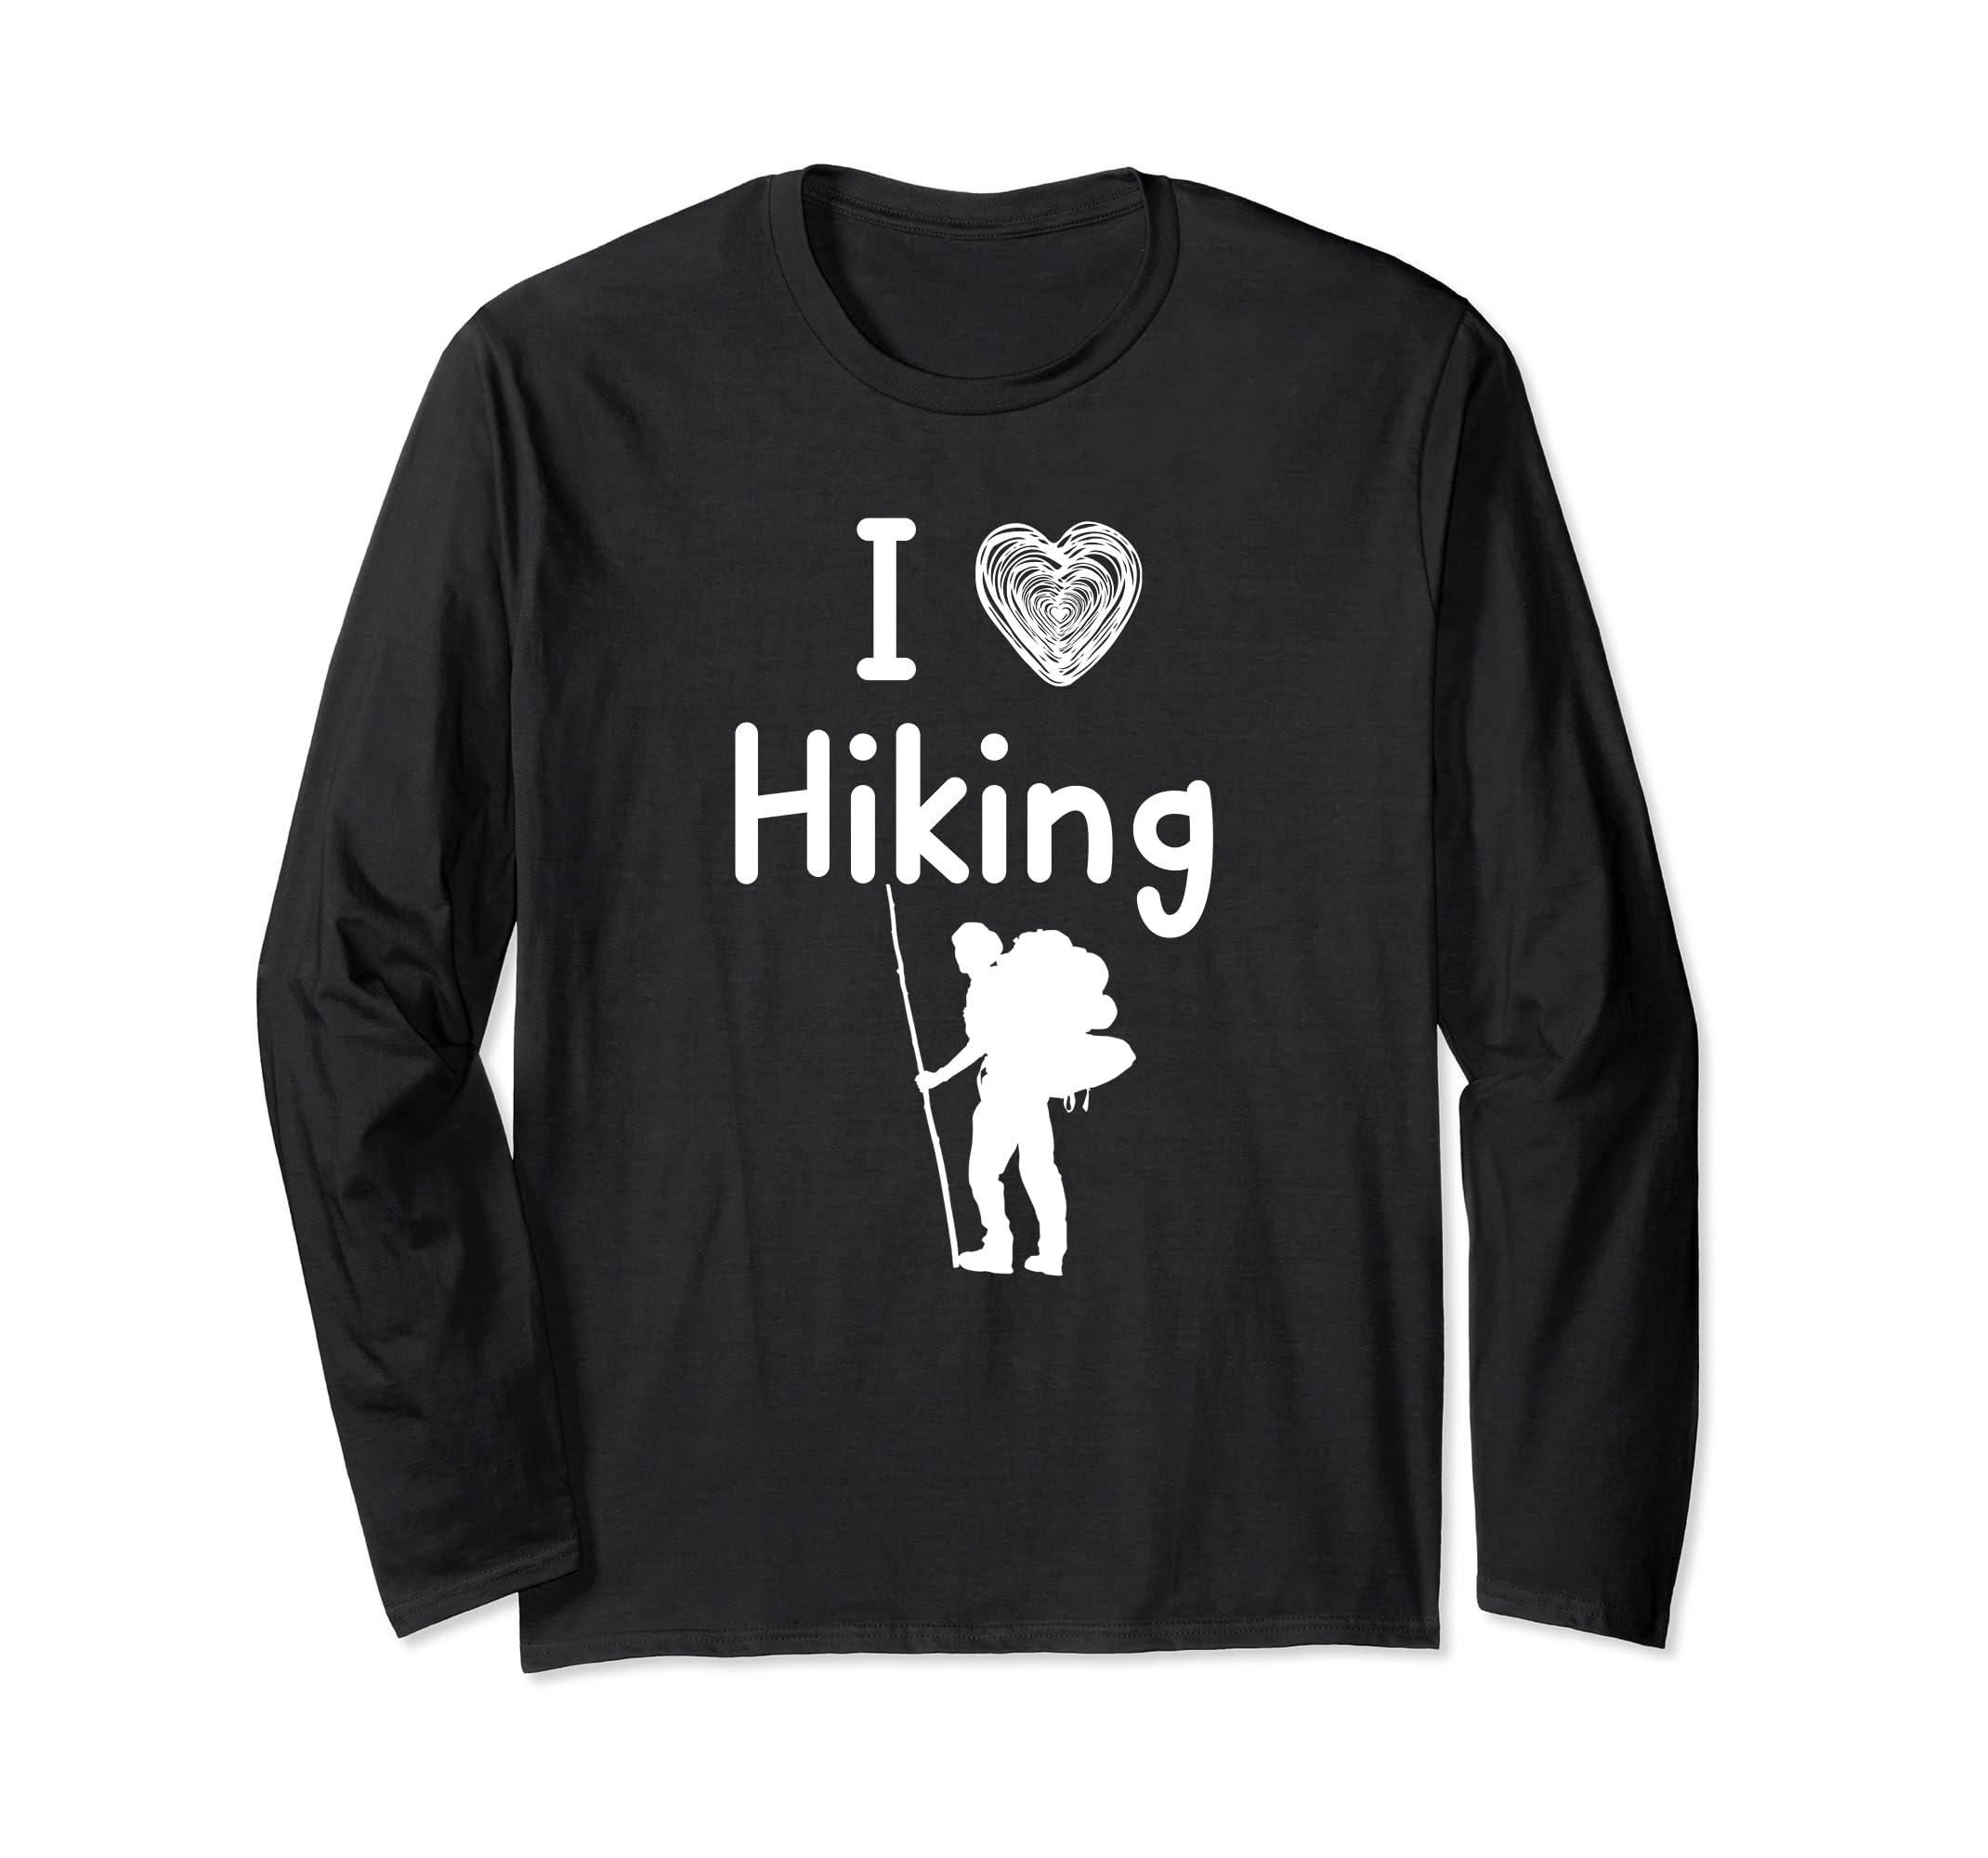 Camping, Tent, Hiking, Nature Long Sleeve T shirt / I heart-ln